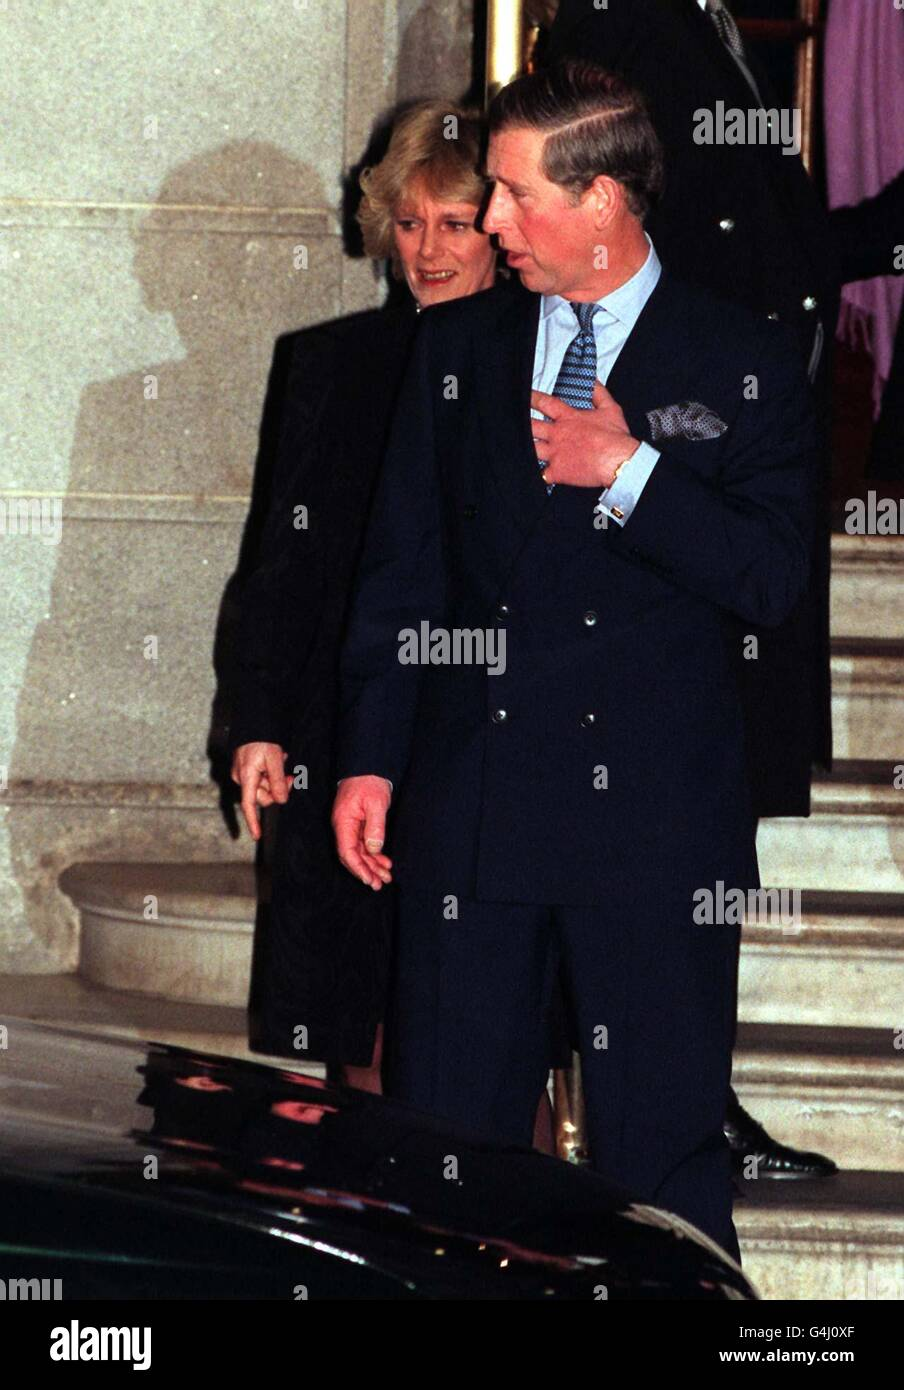 Prince of Wales & Camilla: Ritz 3 Stock Photo